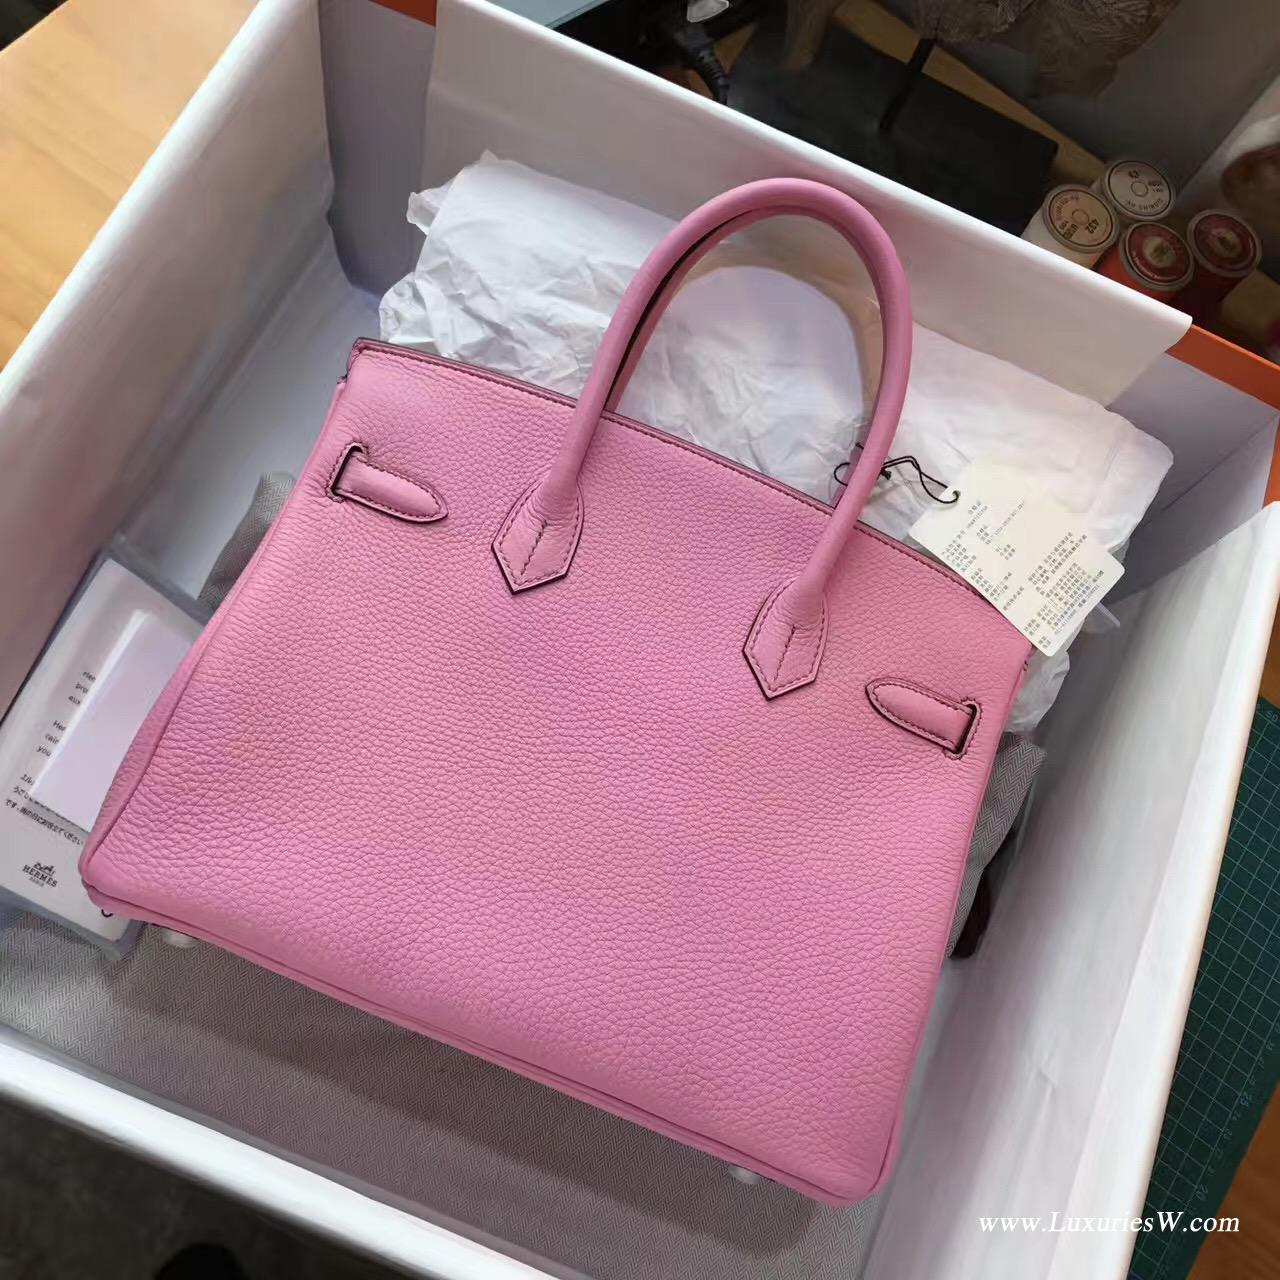 愛馬仕hermes 鉑金包Birkin 30 togo 5P Pink櫻花粉色銀扣